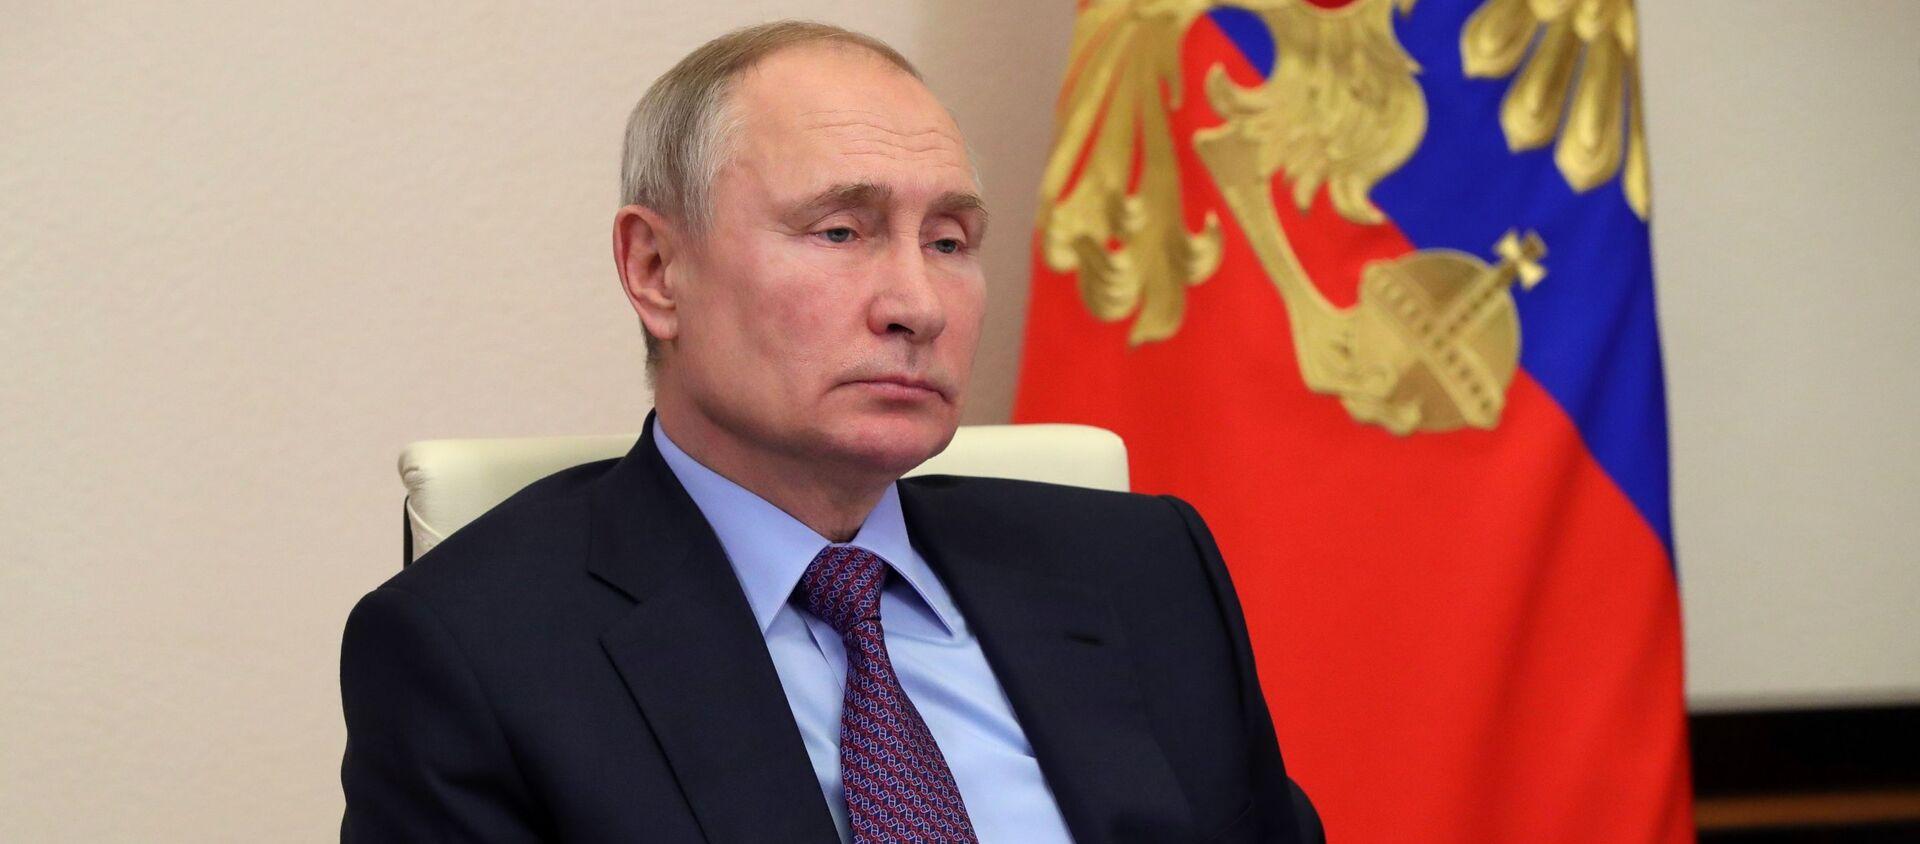 Tổng thống Nga Vladimir Putin  - Sputnik Việt Nam, 1920, 22.06.2021